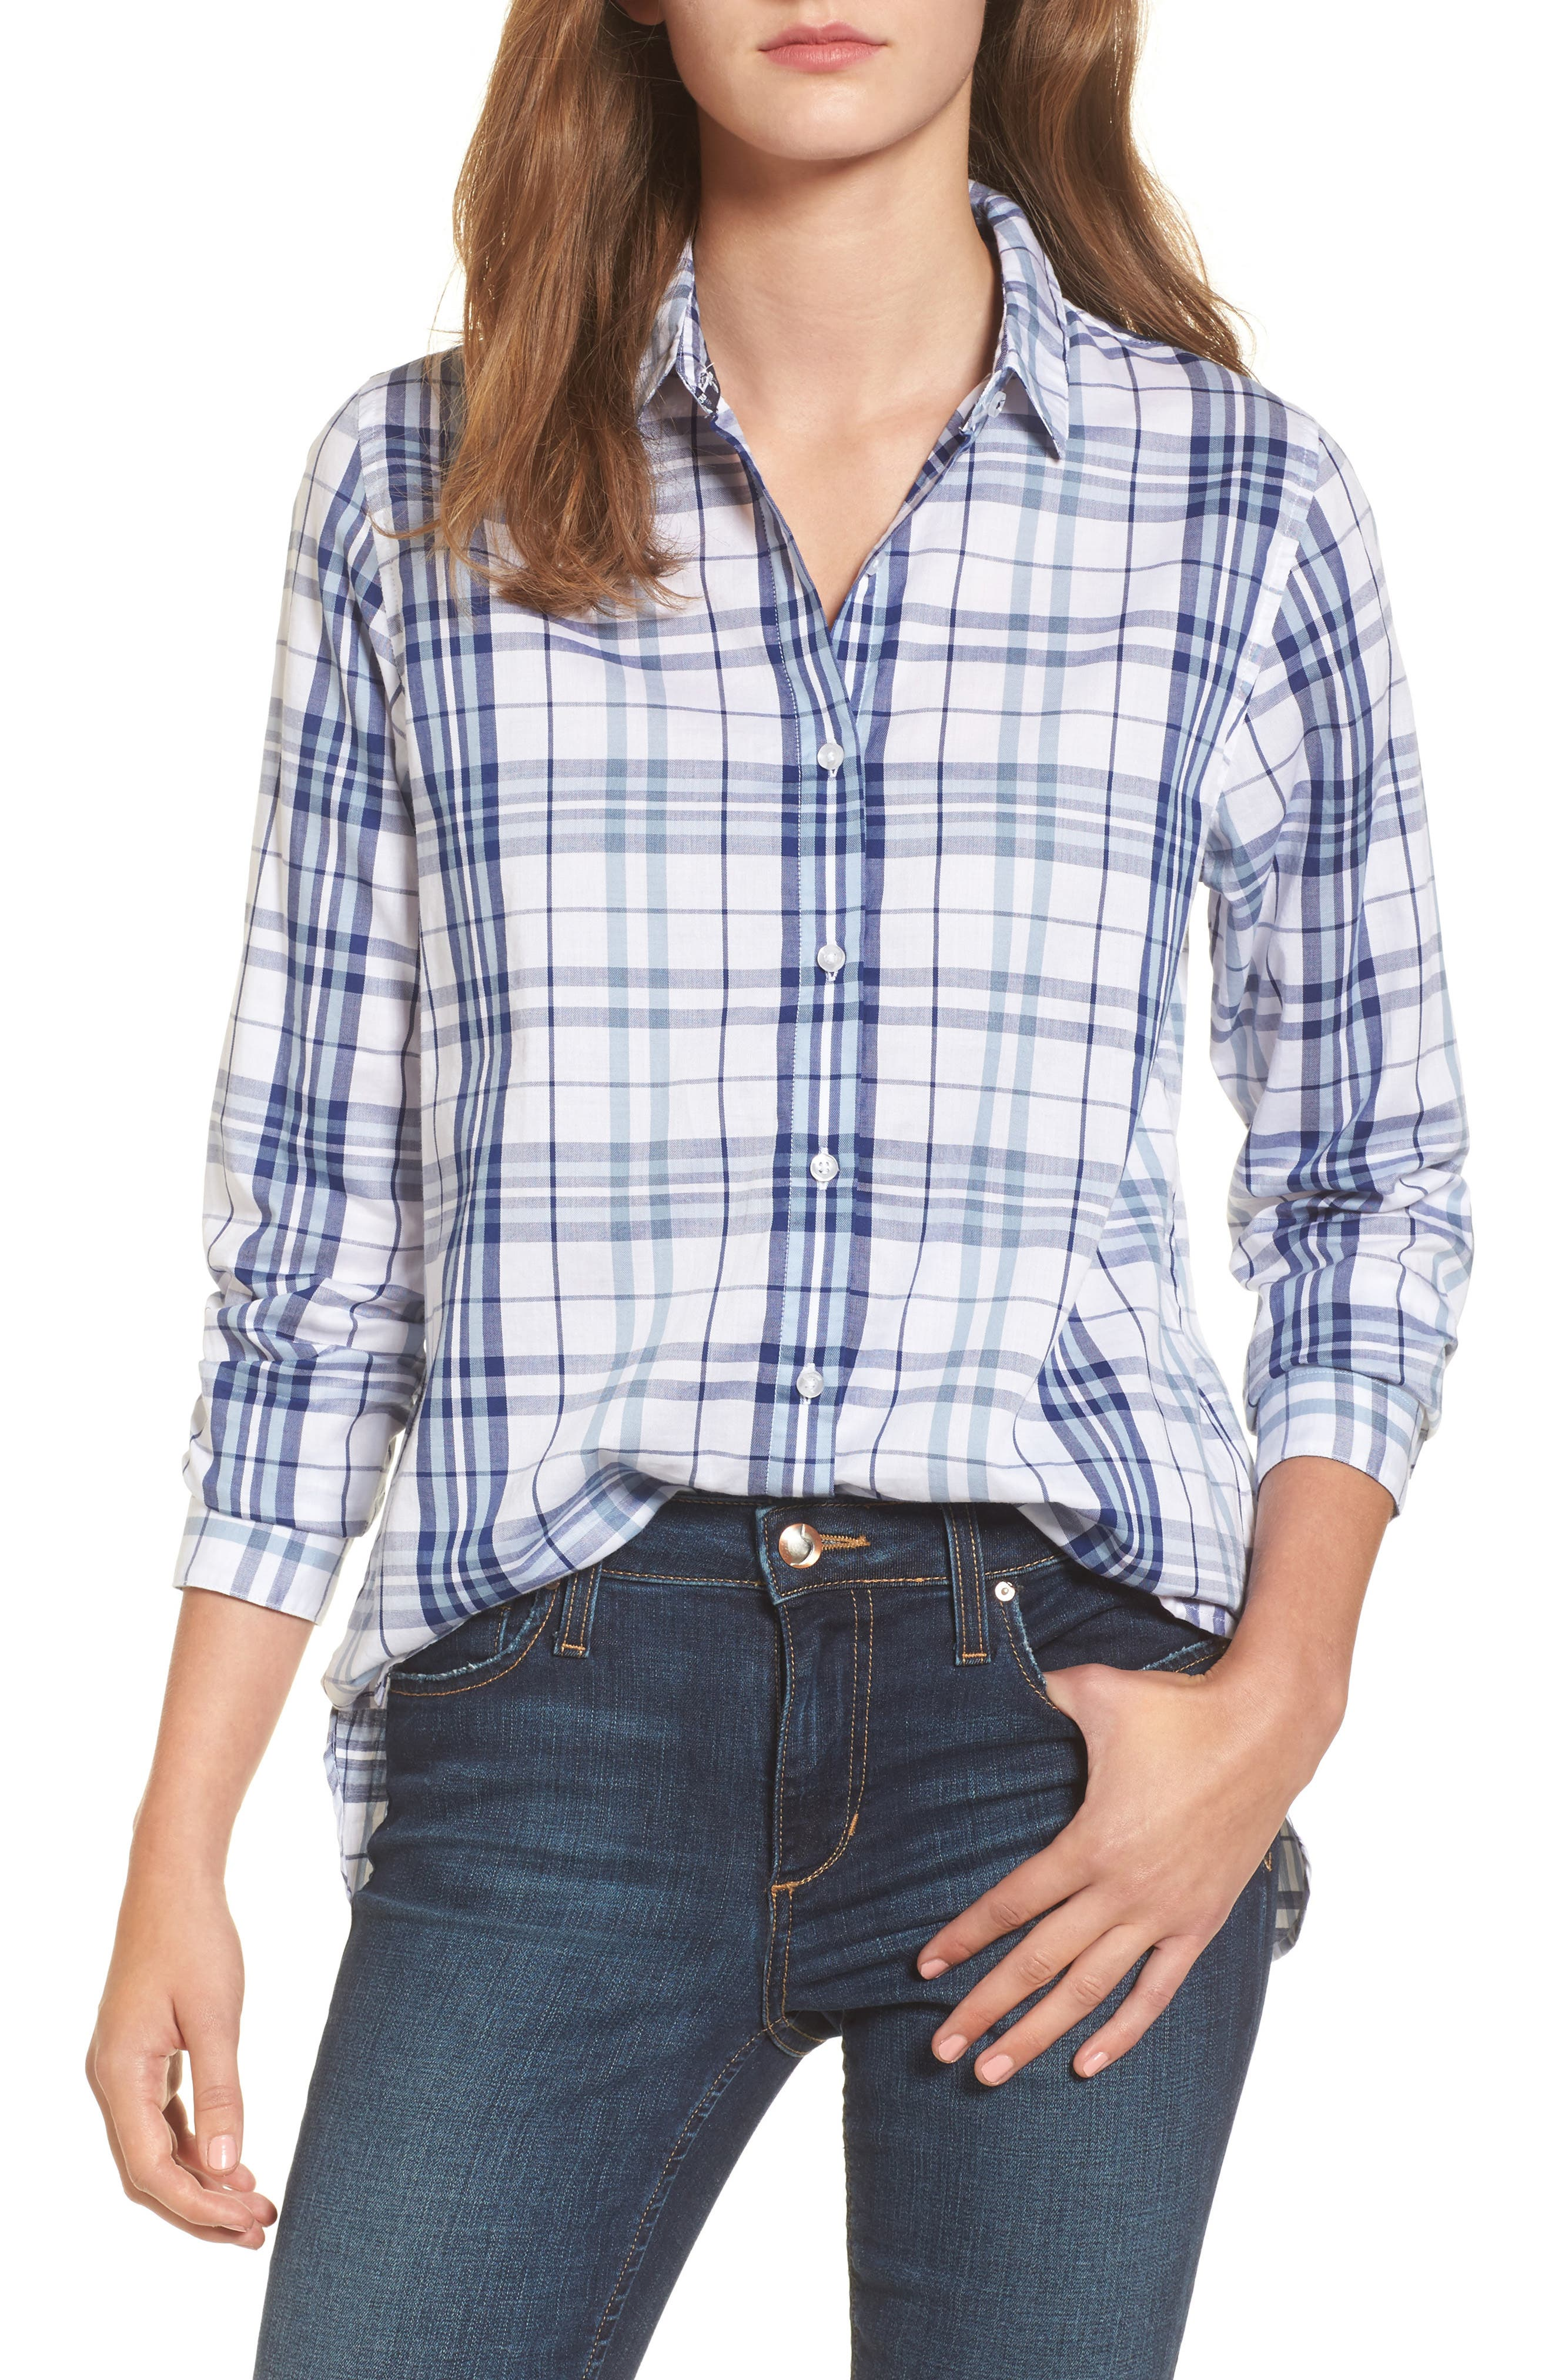 Selsey Plaid Shirt,                             Main thumbnail 1, color,                             White/ Coastal Blue